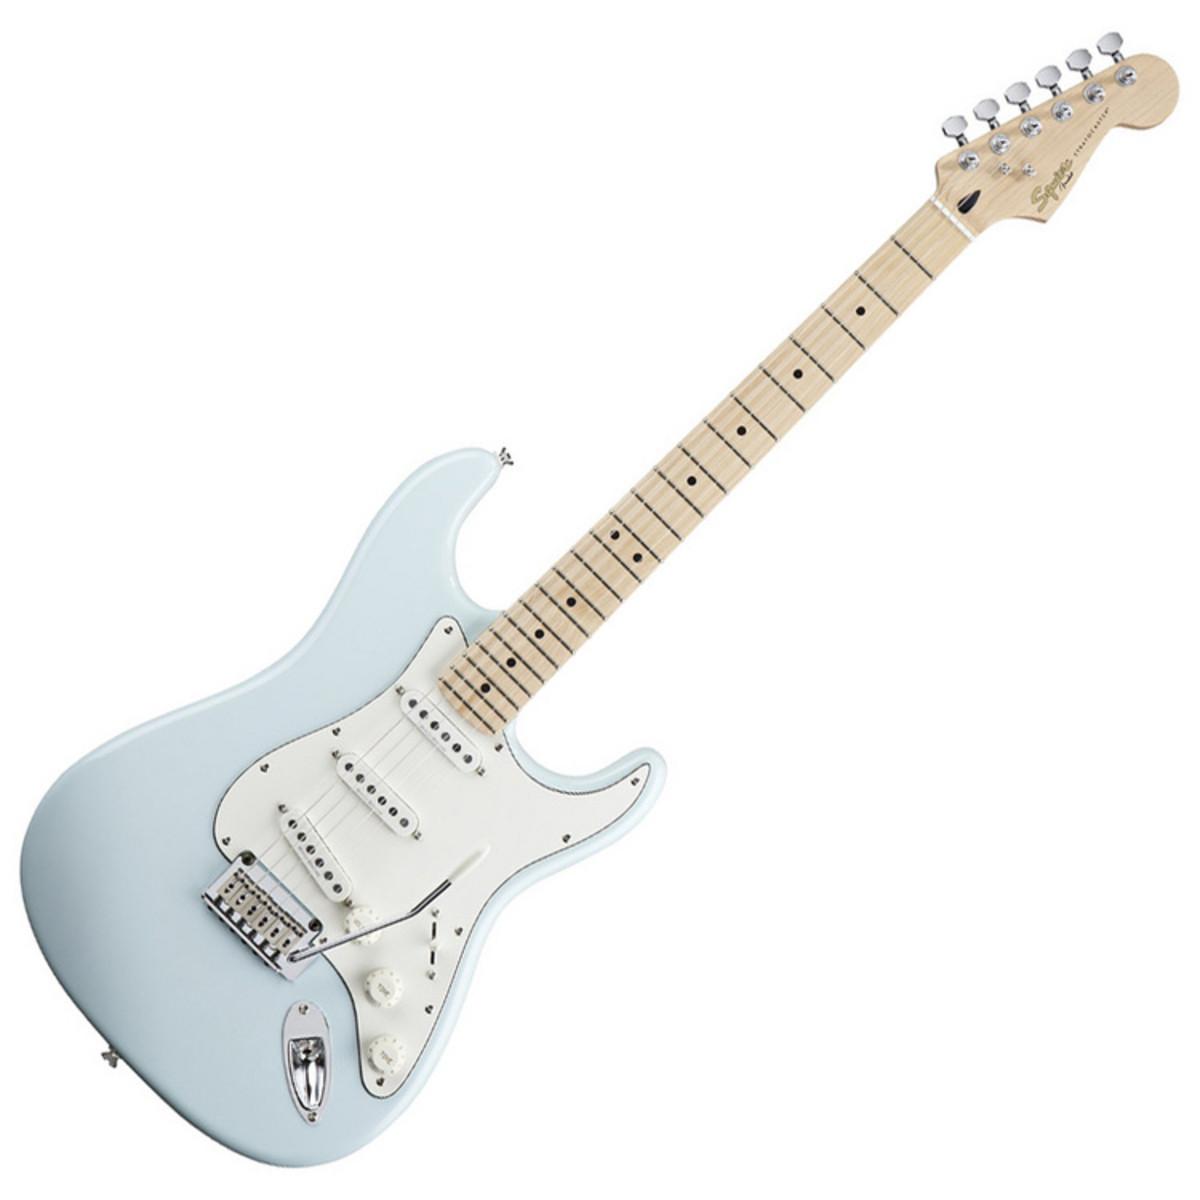 Clapton Eric Fender Al Instruments Sotheby S L15414lot8kqkjen